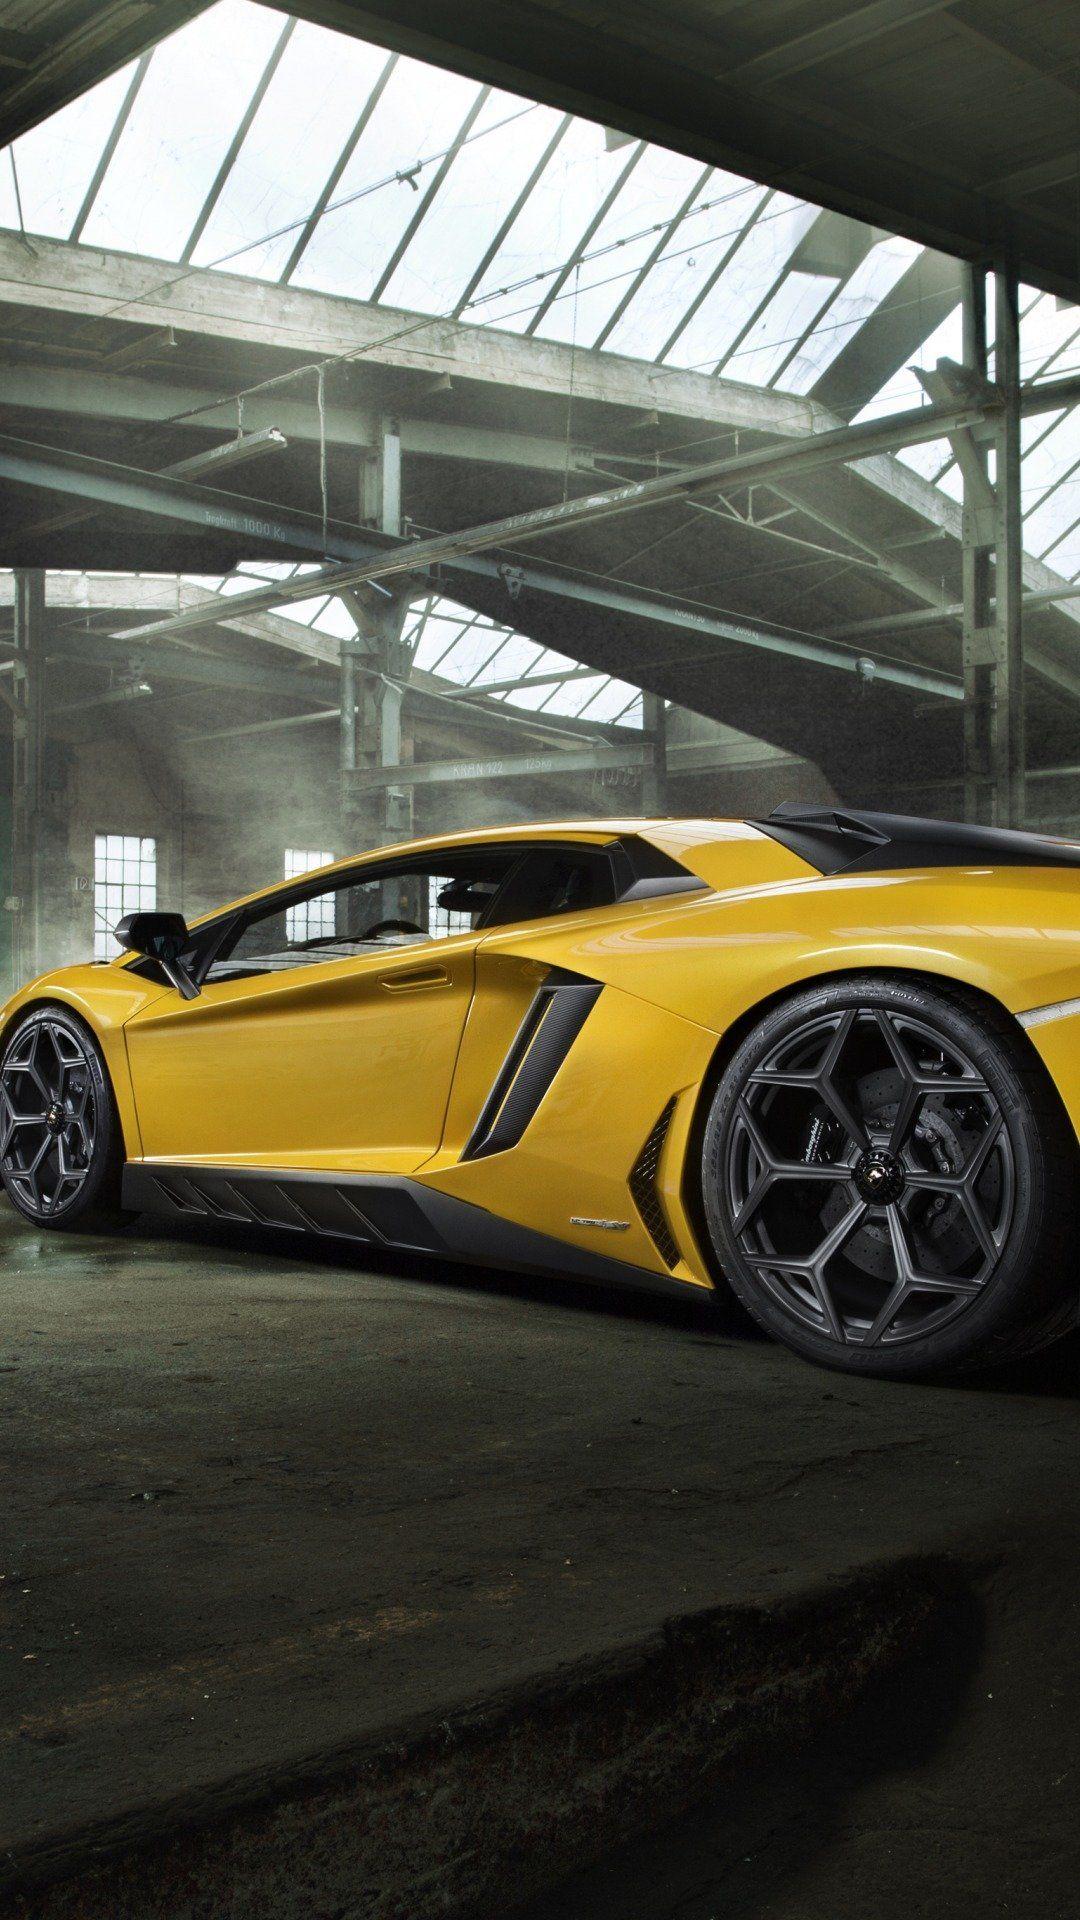 Pin by Ilia Guruli on kakuna Luxury cars,